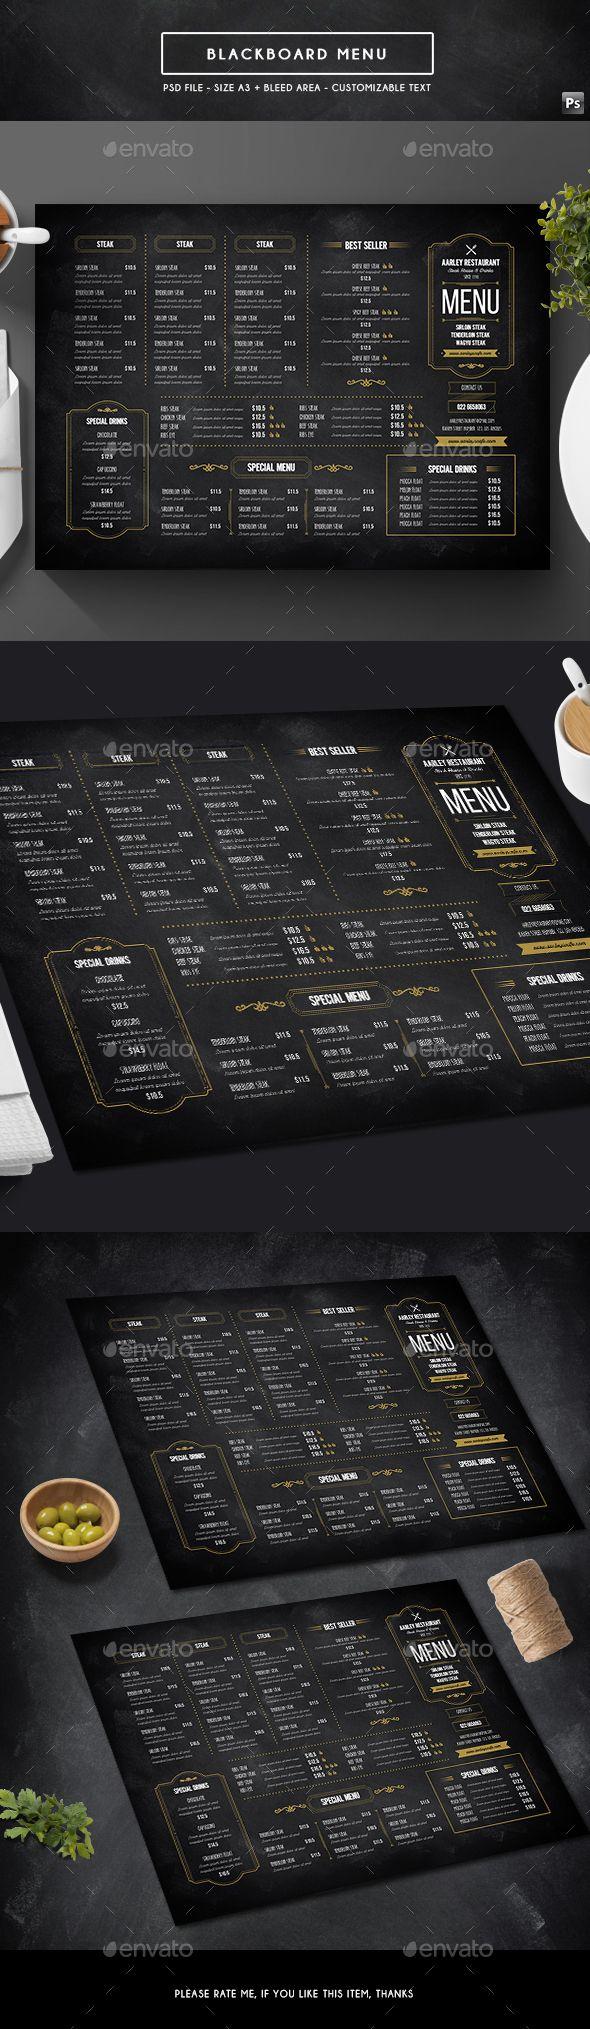 Pin de darina.n en menu | Pinterest | Menus restaurantes ...